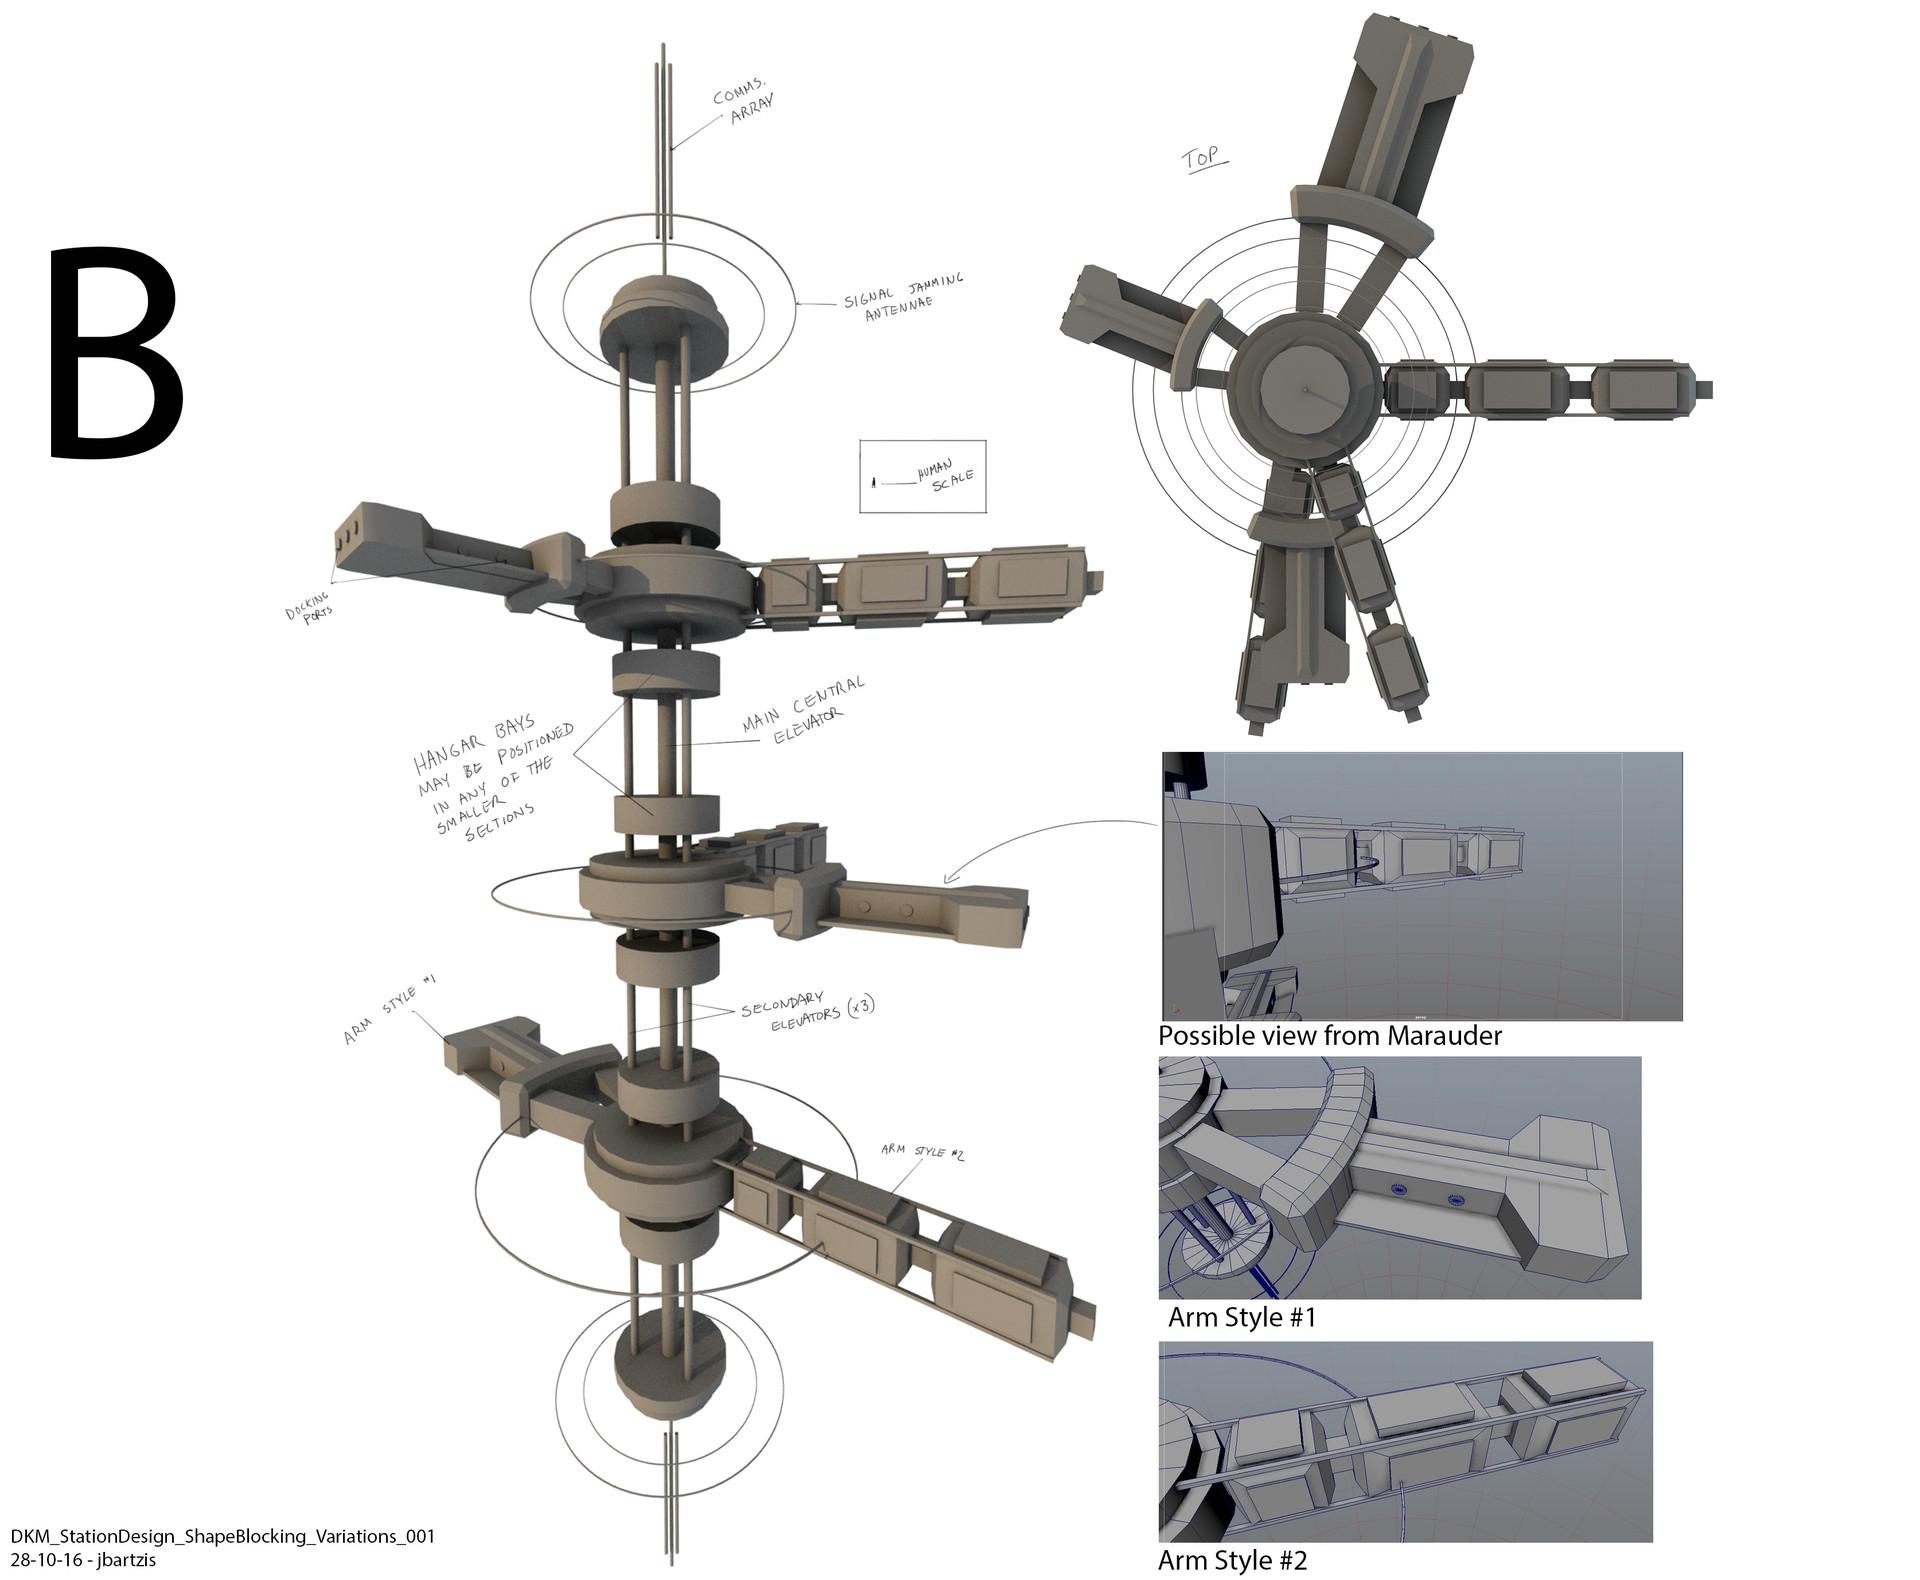 Jeff bartzis darkmatter stationdesign shapeblocking 001 b